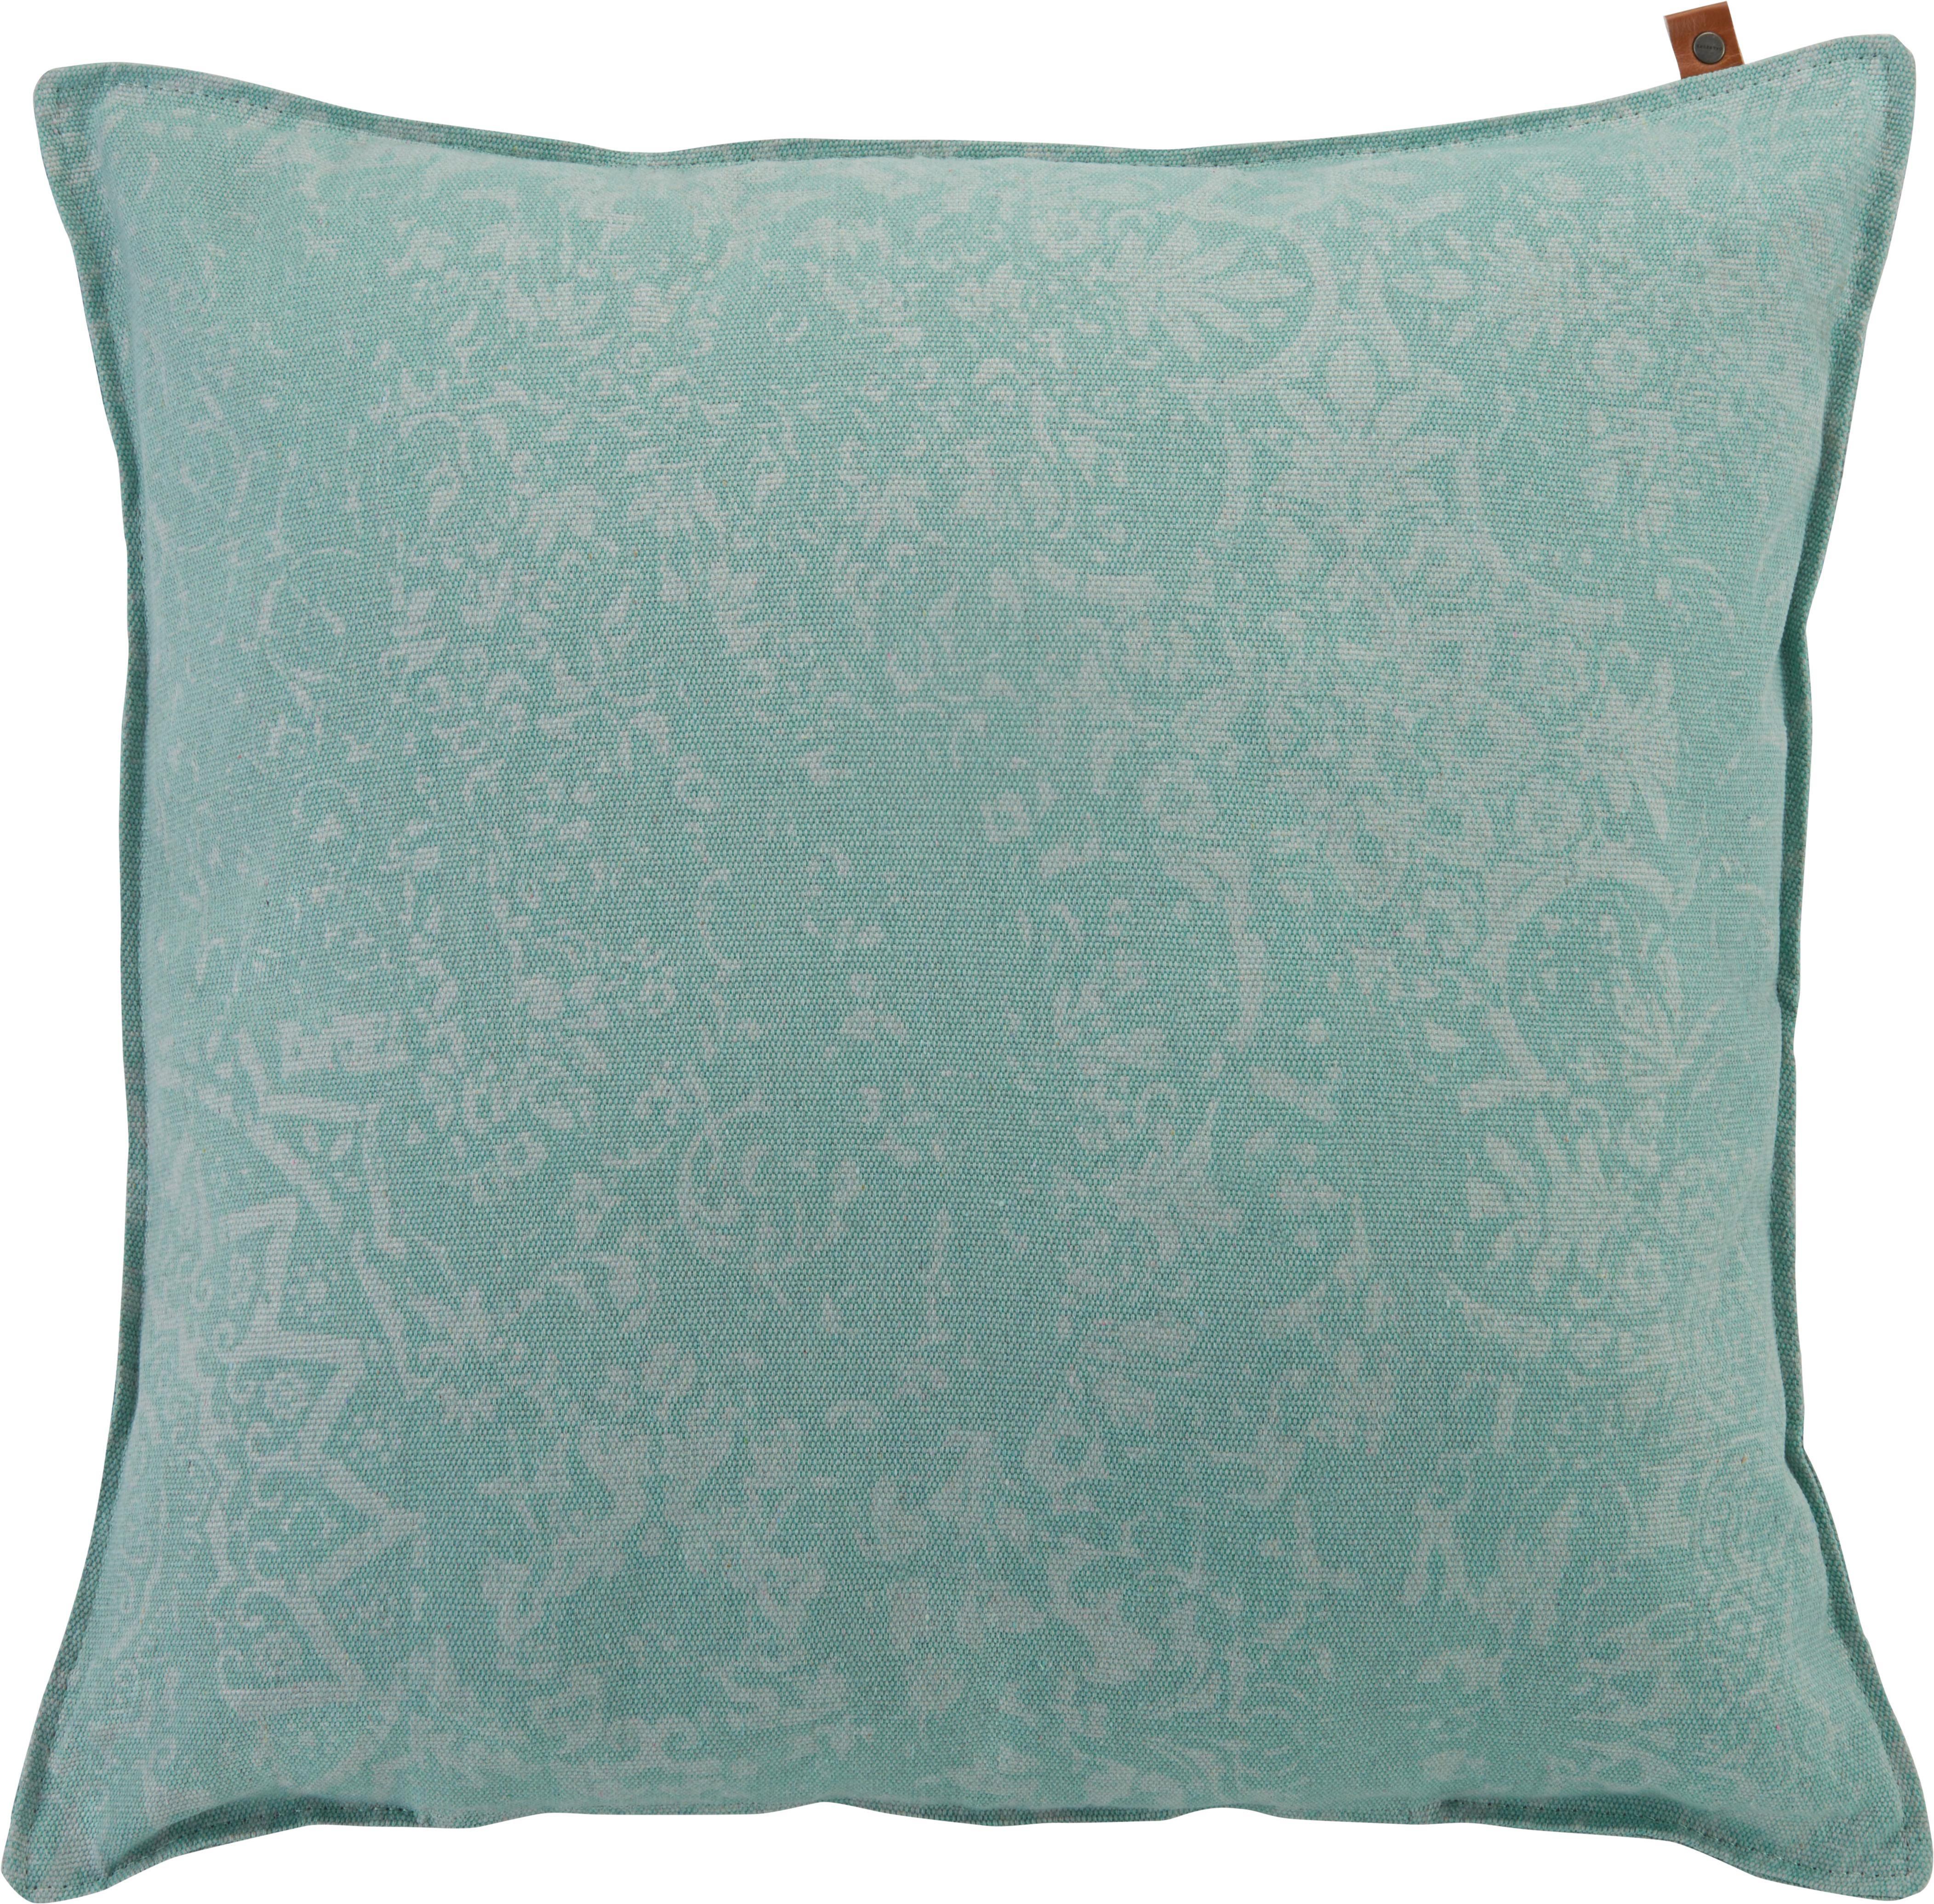 Zierkissen Karim 60x60cm - Mintgrün, MODERN, Textil (60/60cm)